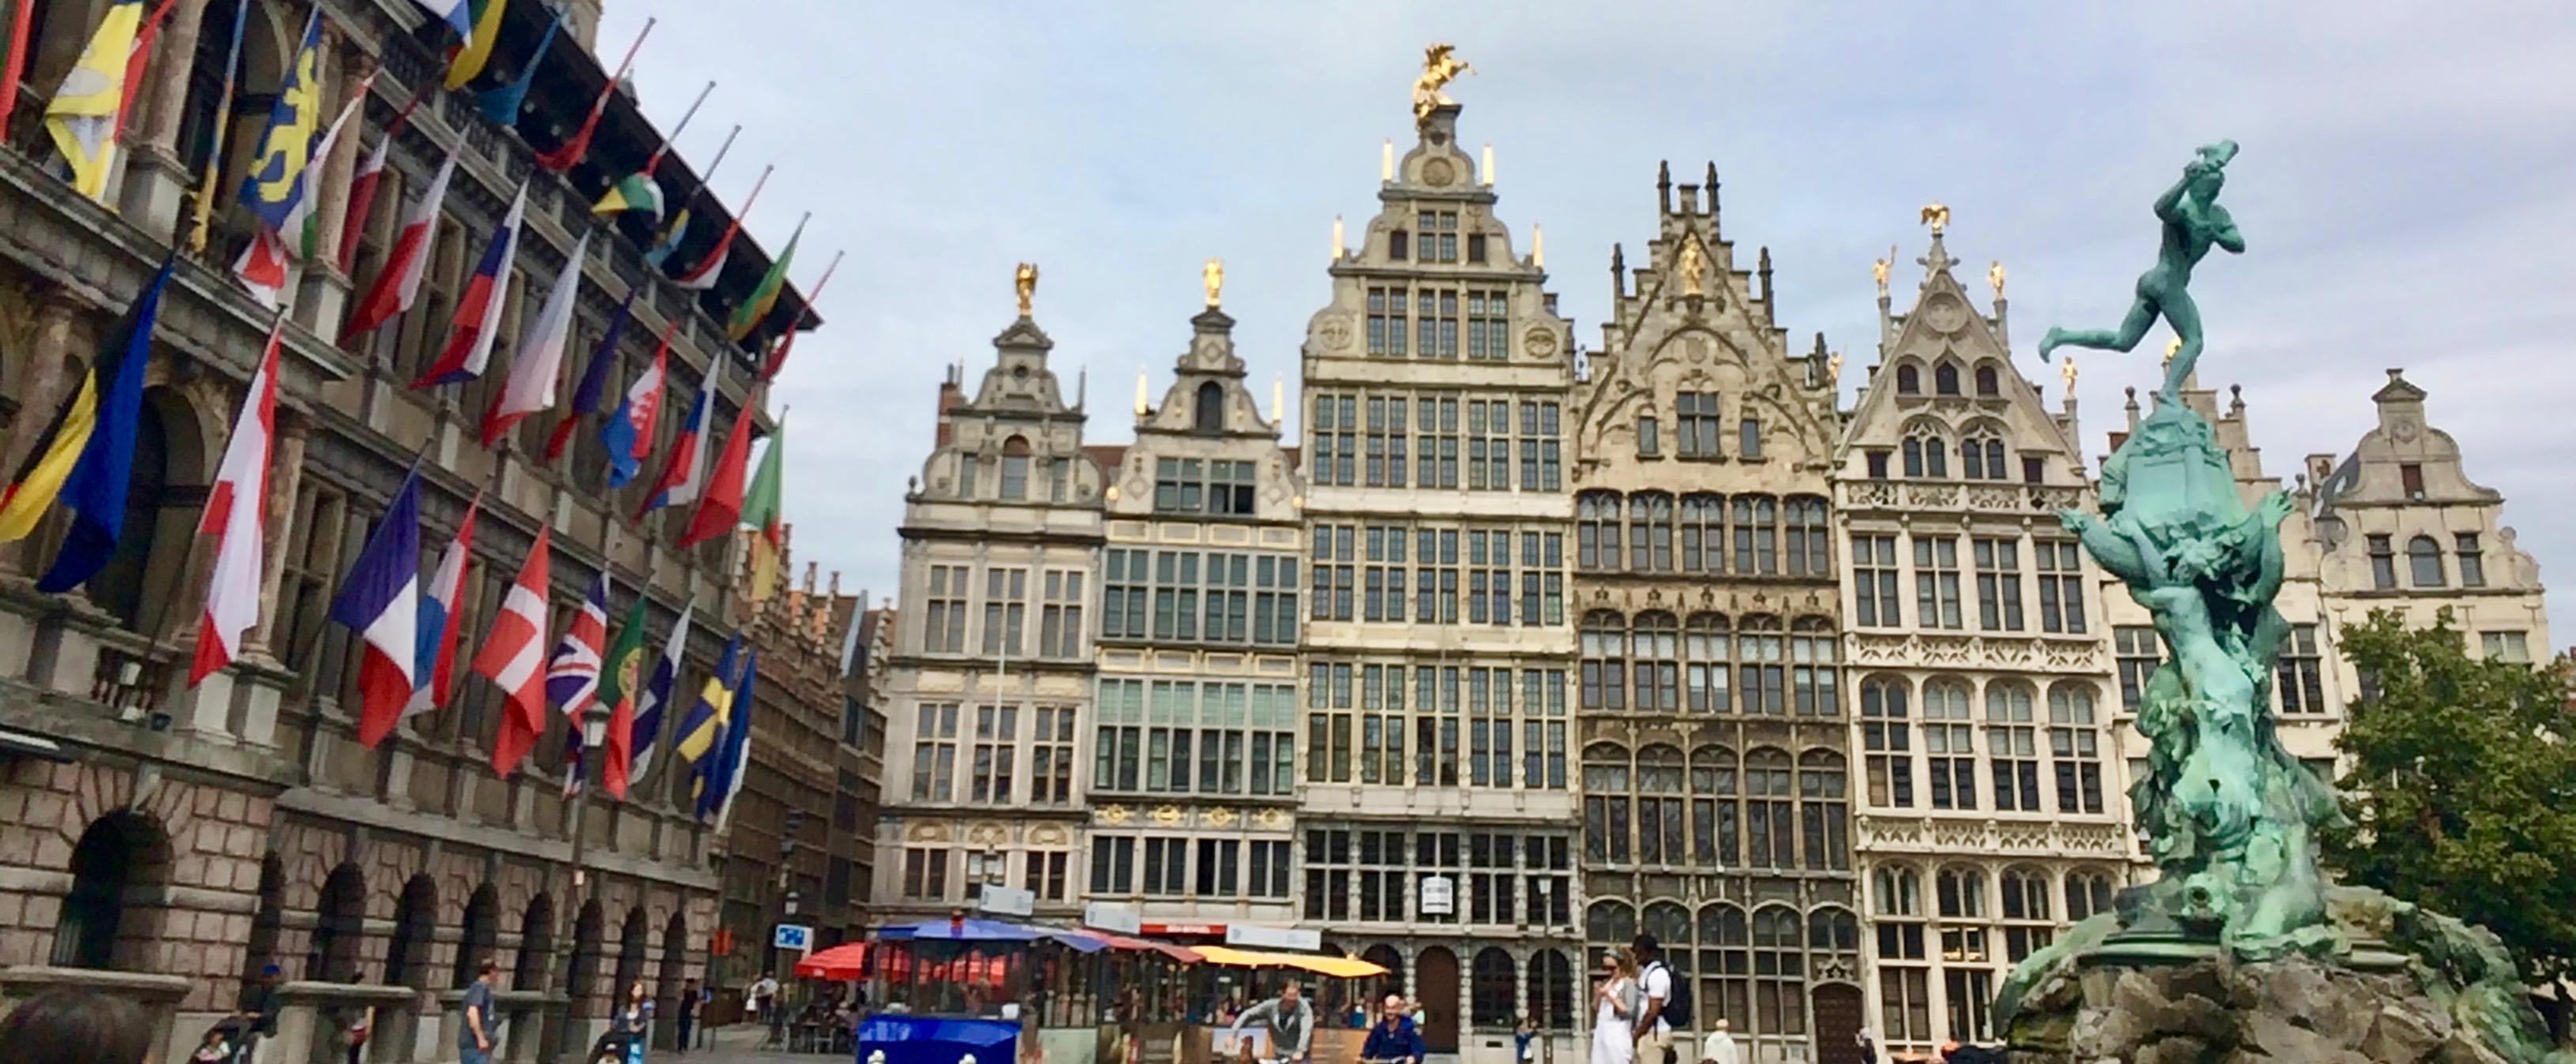 adresses chics, tendances Anvers